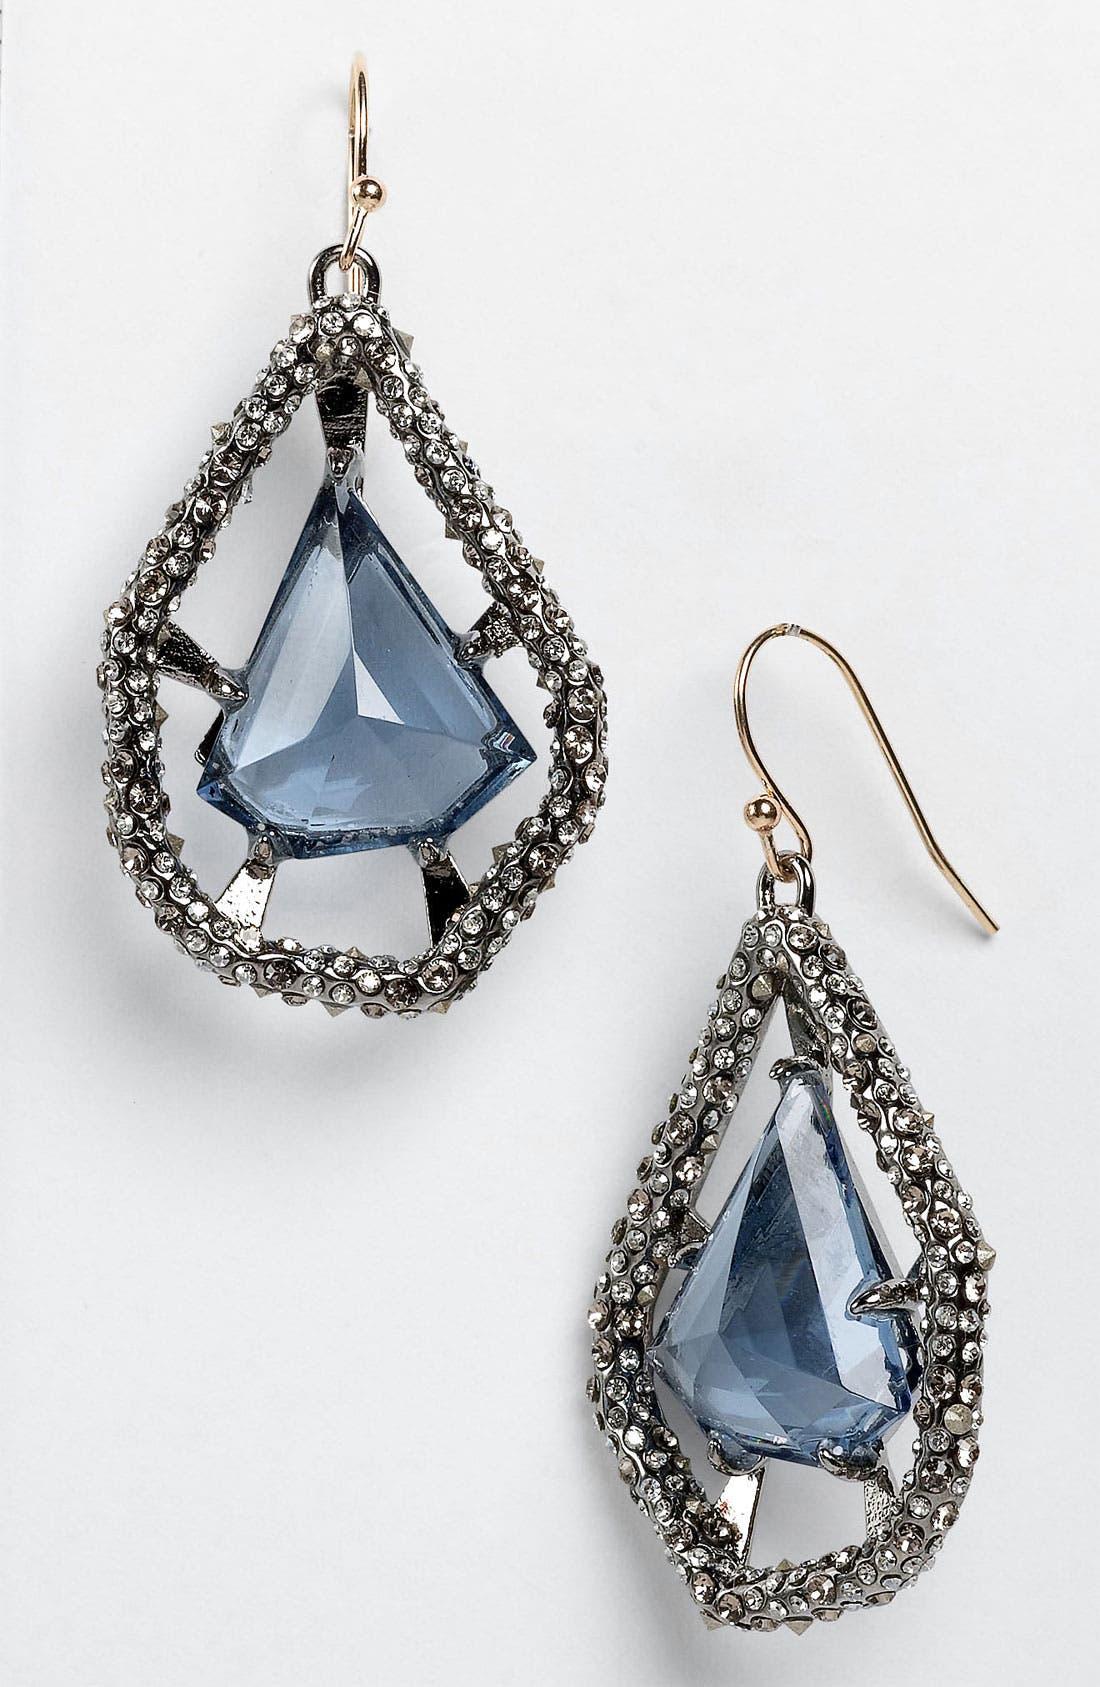 Alternate Image 1 Selected - Alexis Bittar 'Miss Havisham - Deco' Shield Drop Earrings (Nordstrom Exclusive)